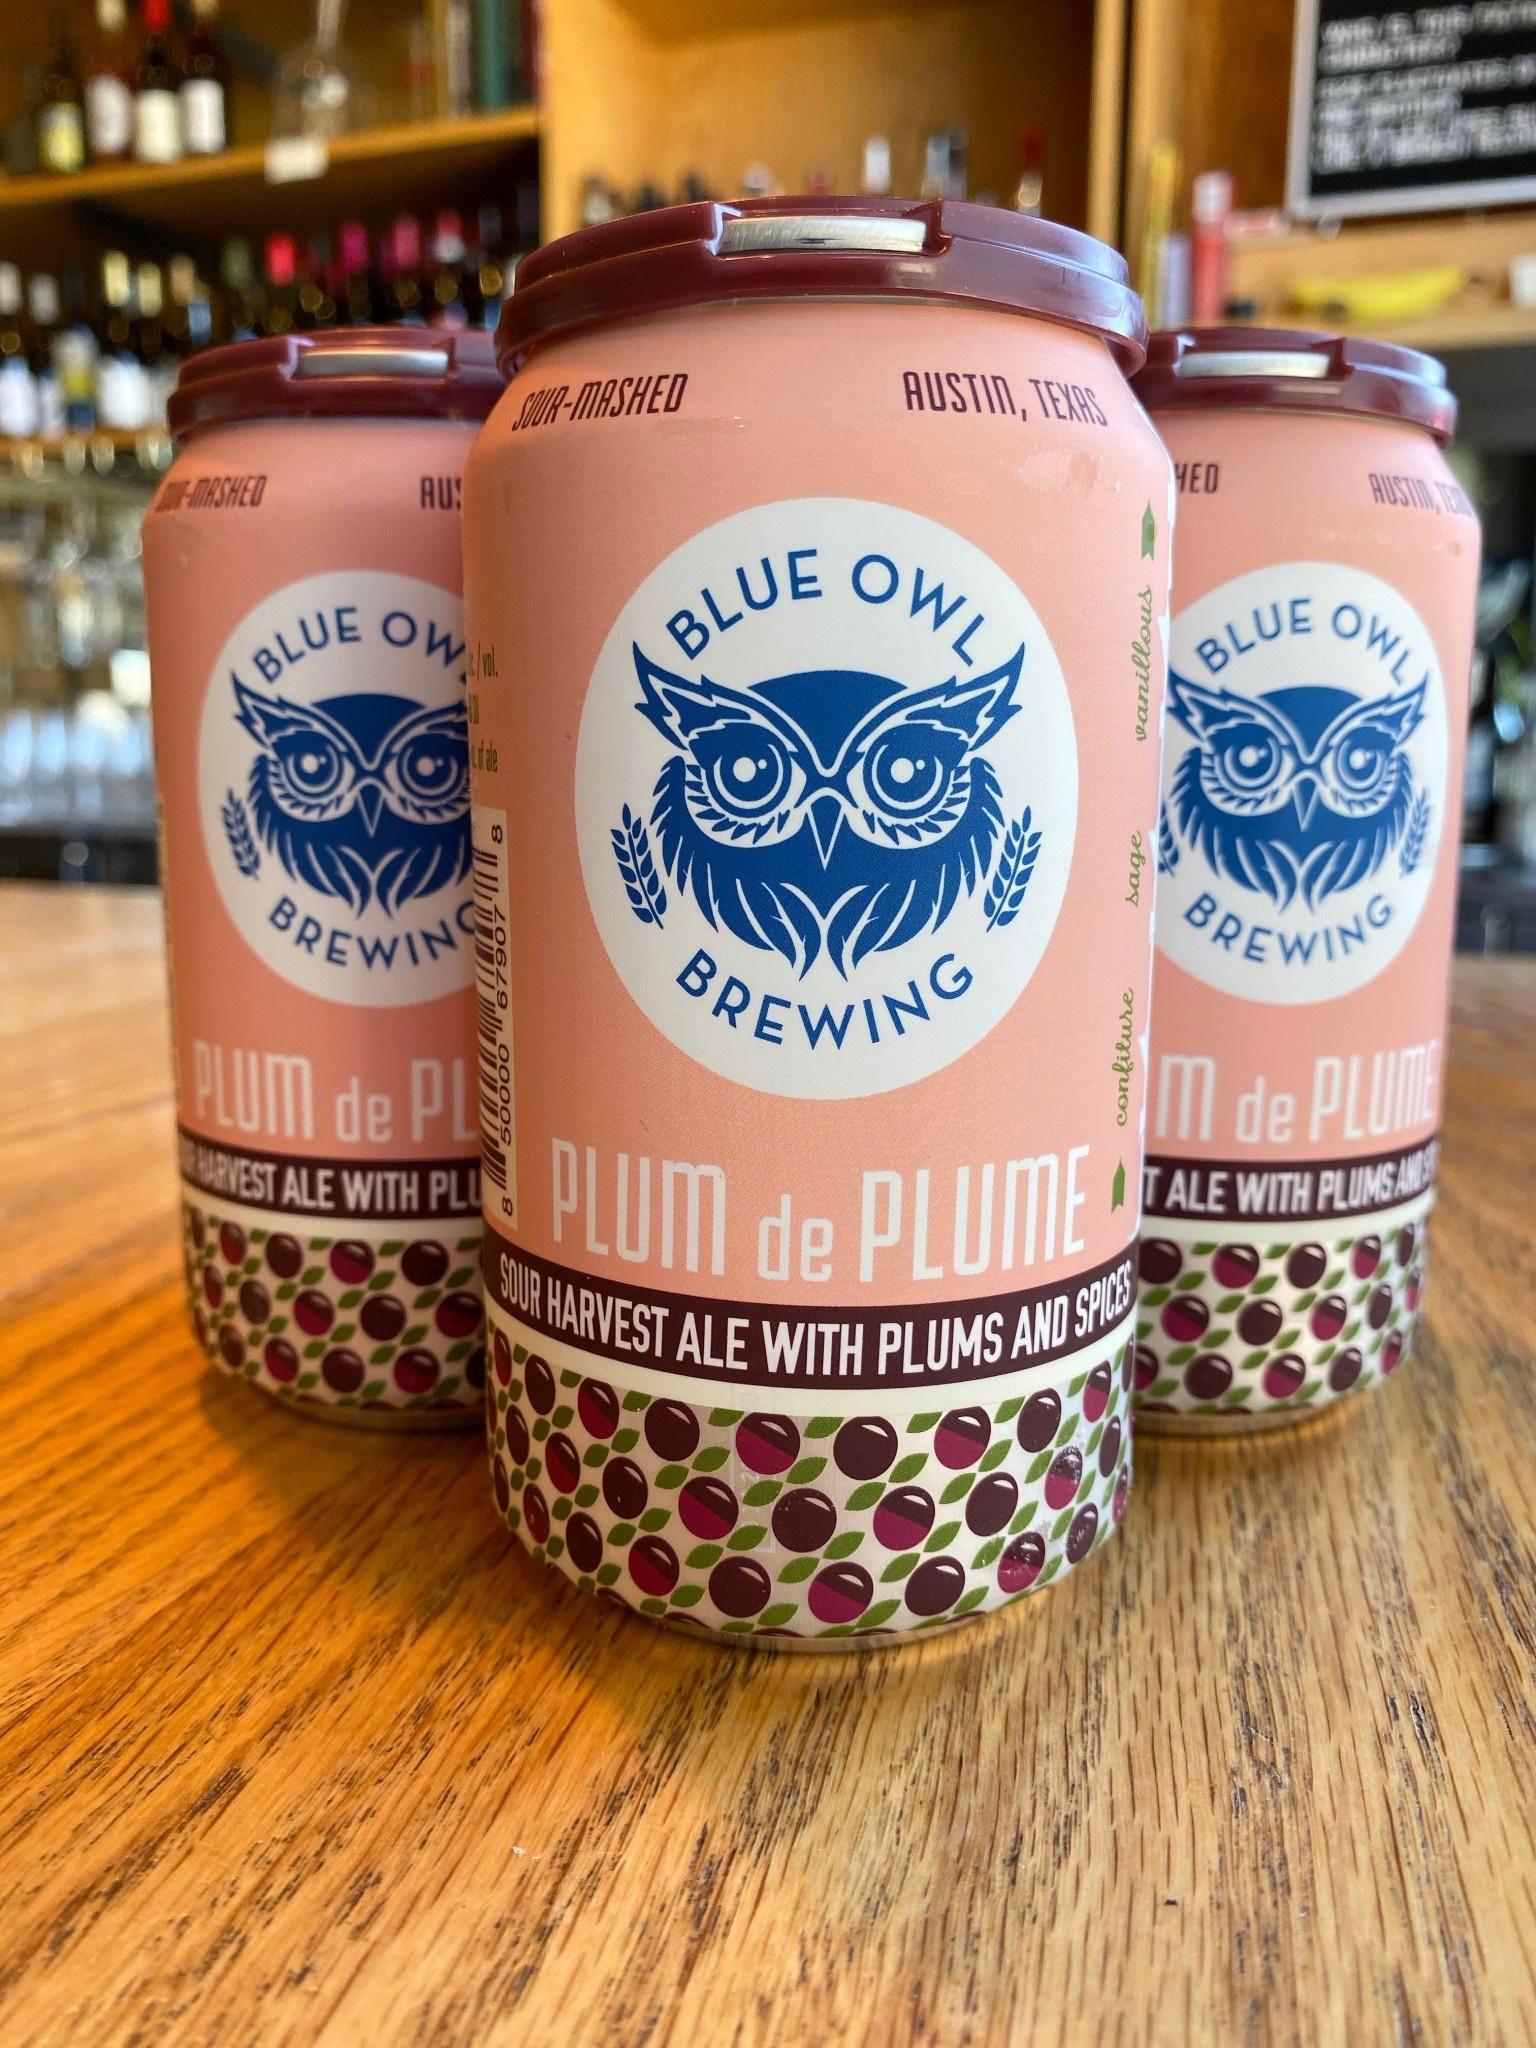 Blue Owl Brewing Blue Owl Brewing Plum de Plume 12oz 4pk